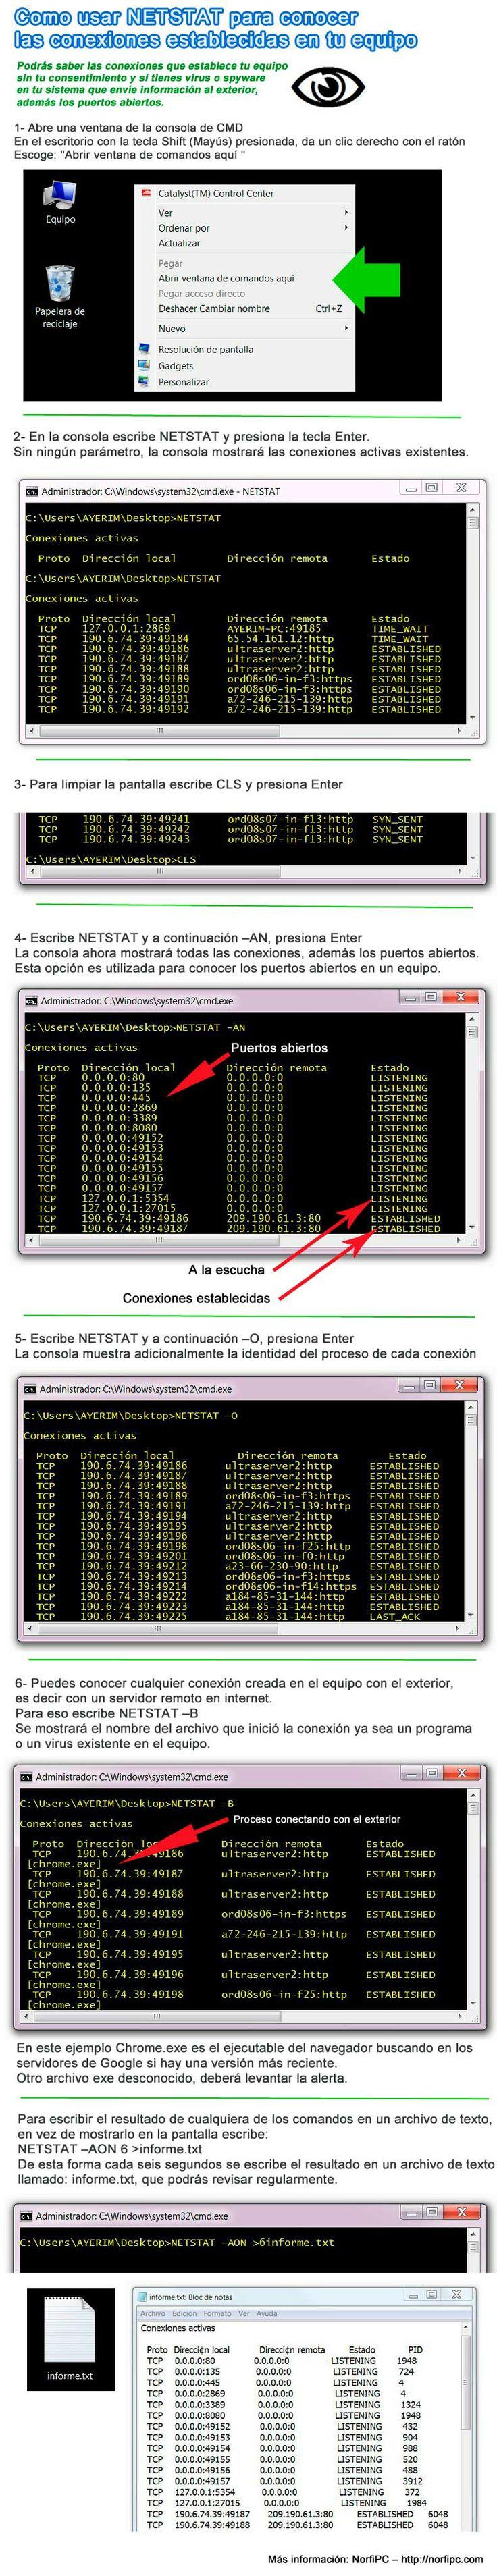 how to use netstat windows